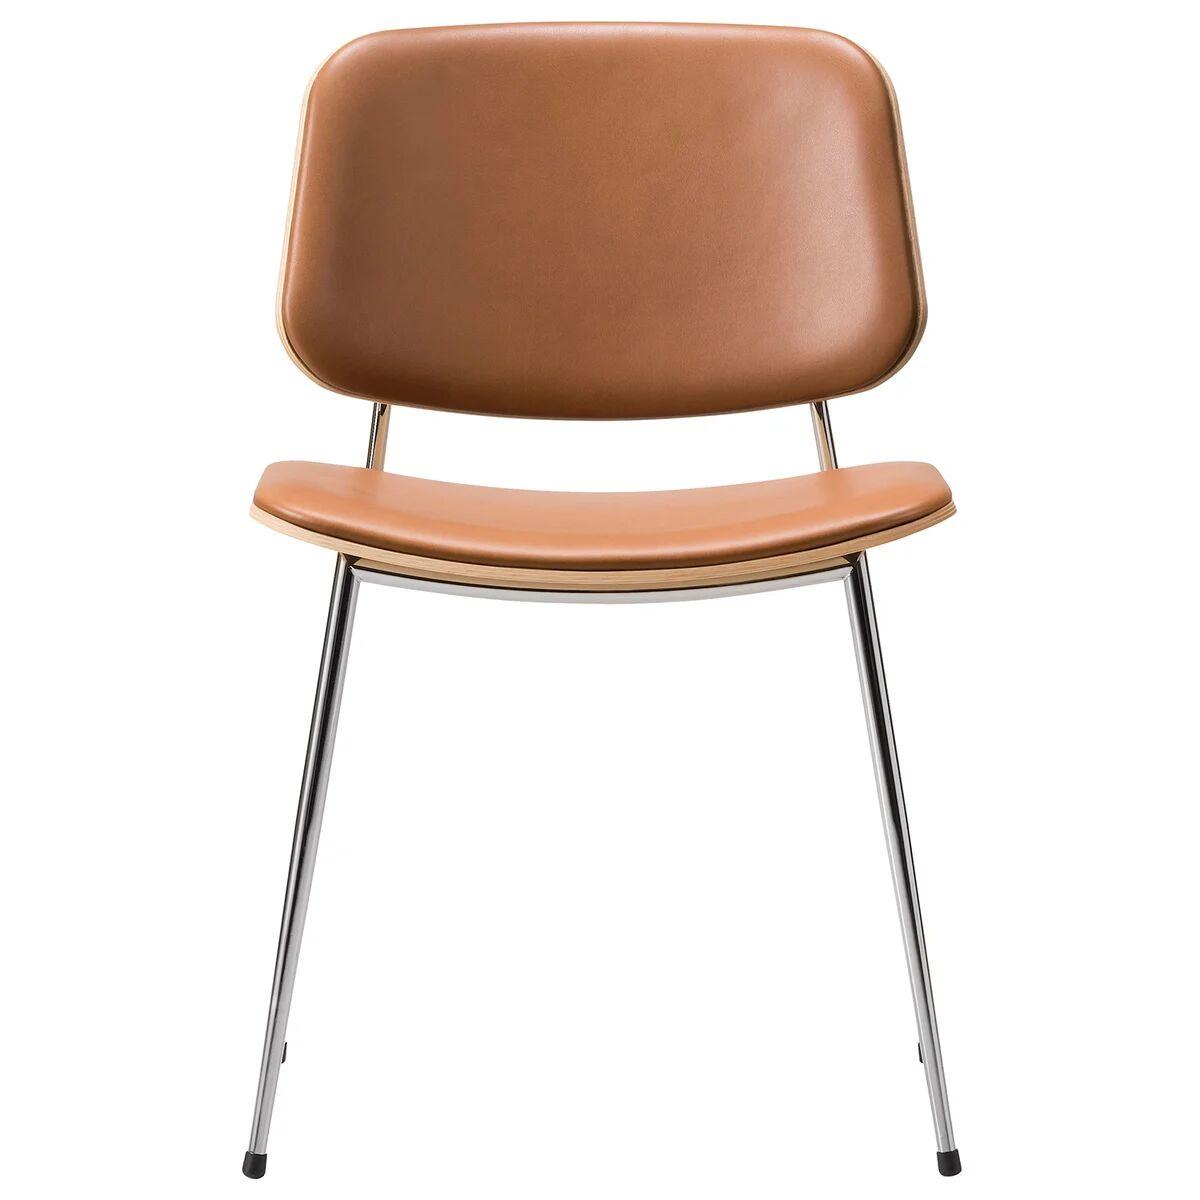 Fredericia Søborg tuoli 3062, kromattu runko, lakattu tammi - ruskea nahka